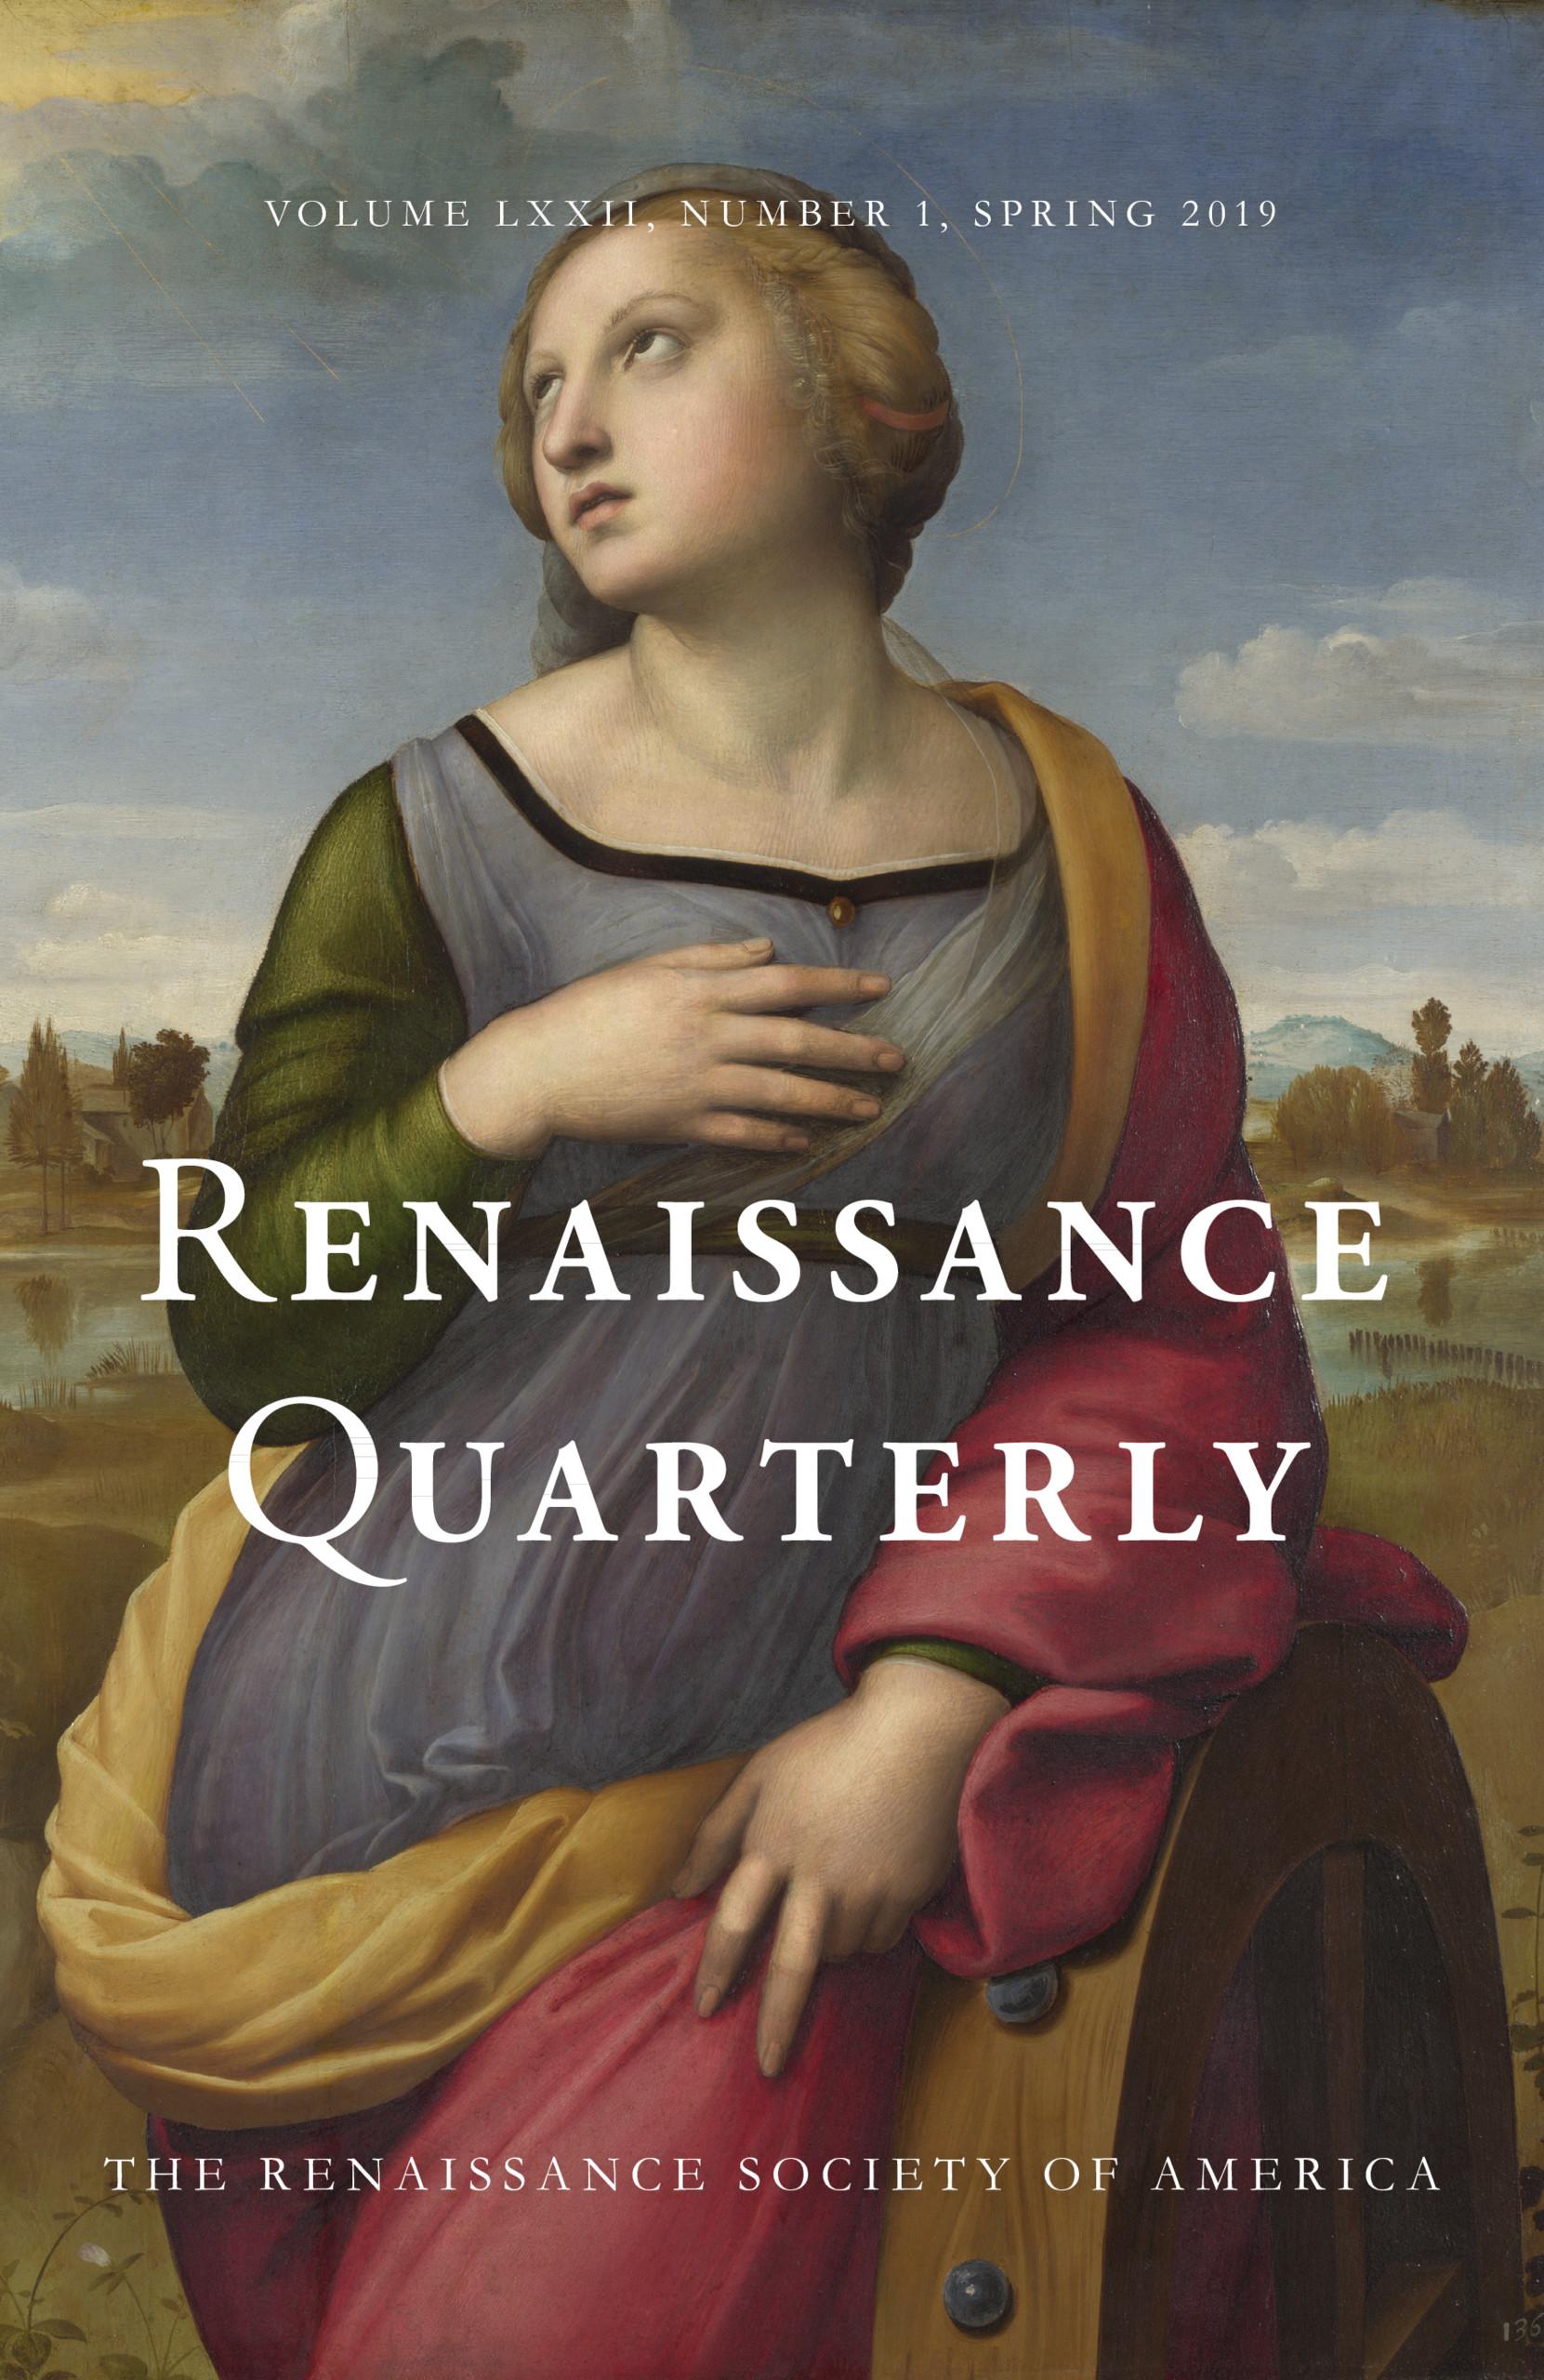 Image result for renaissance quarterly